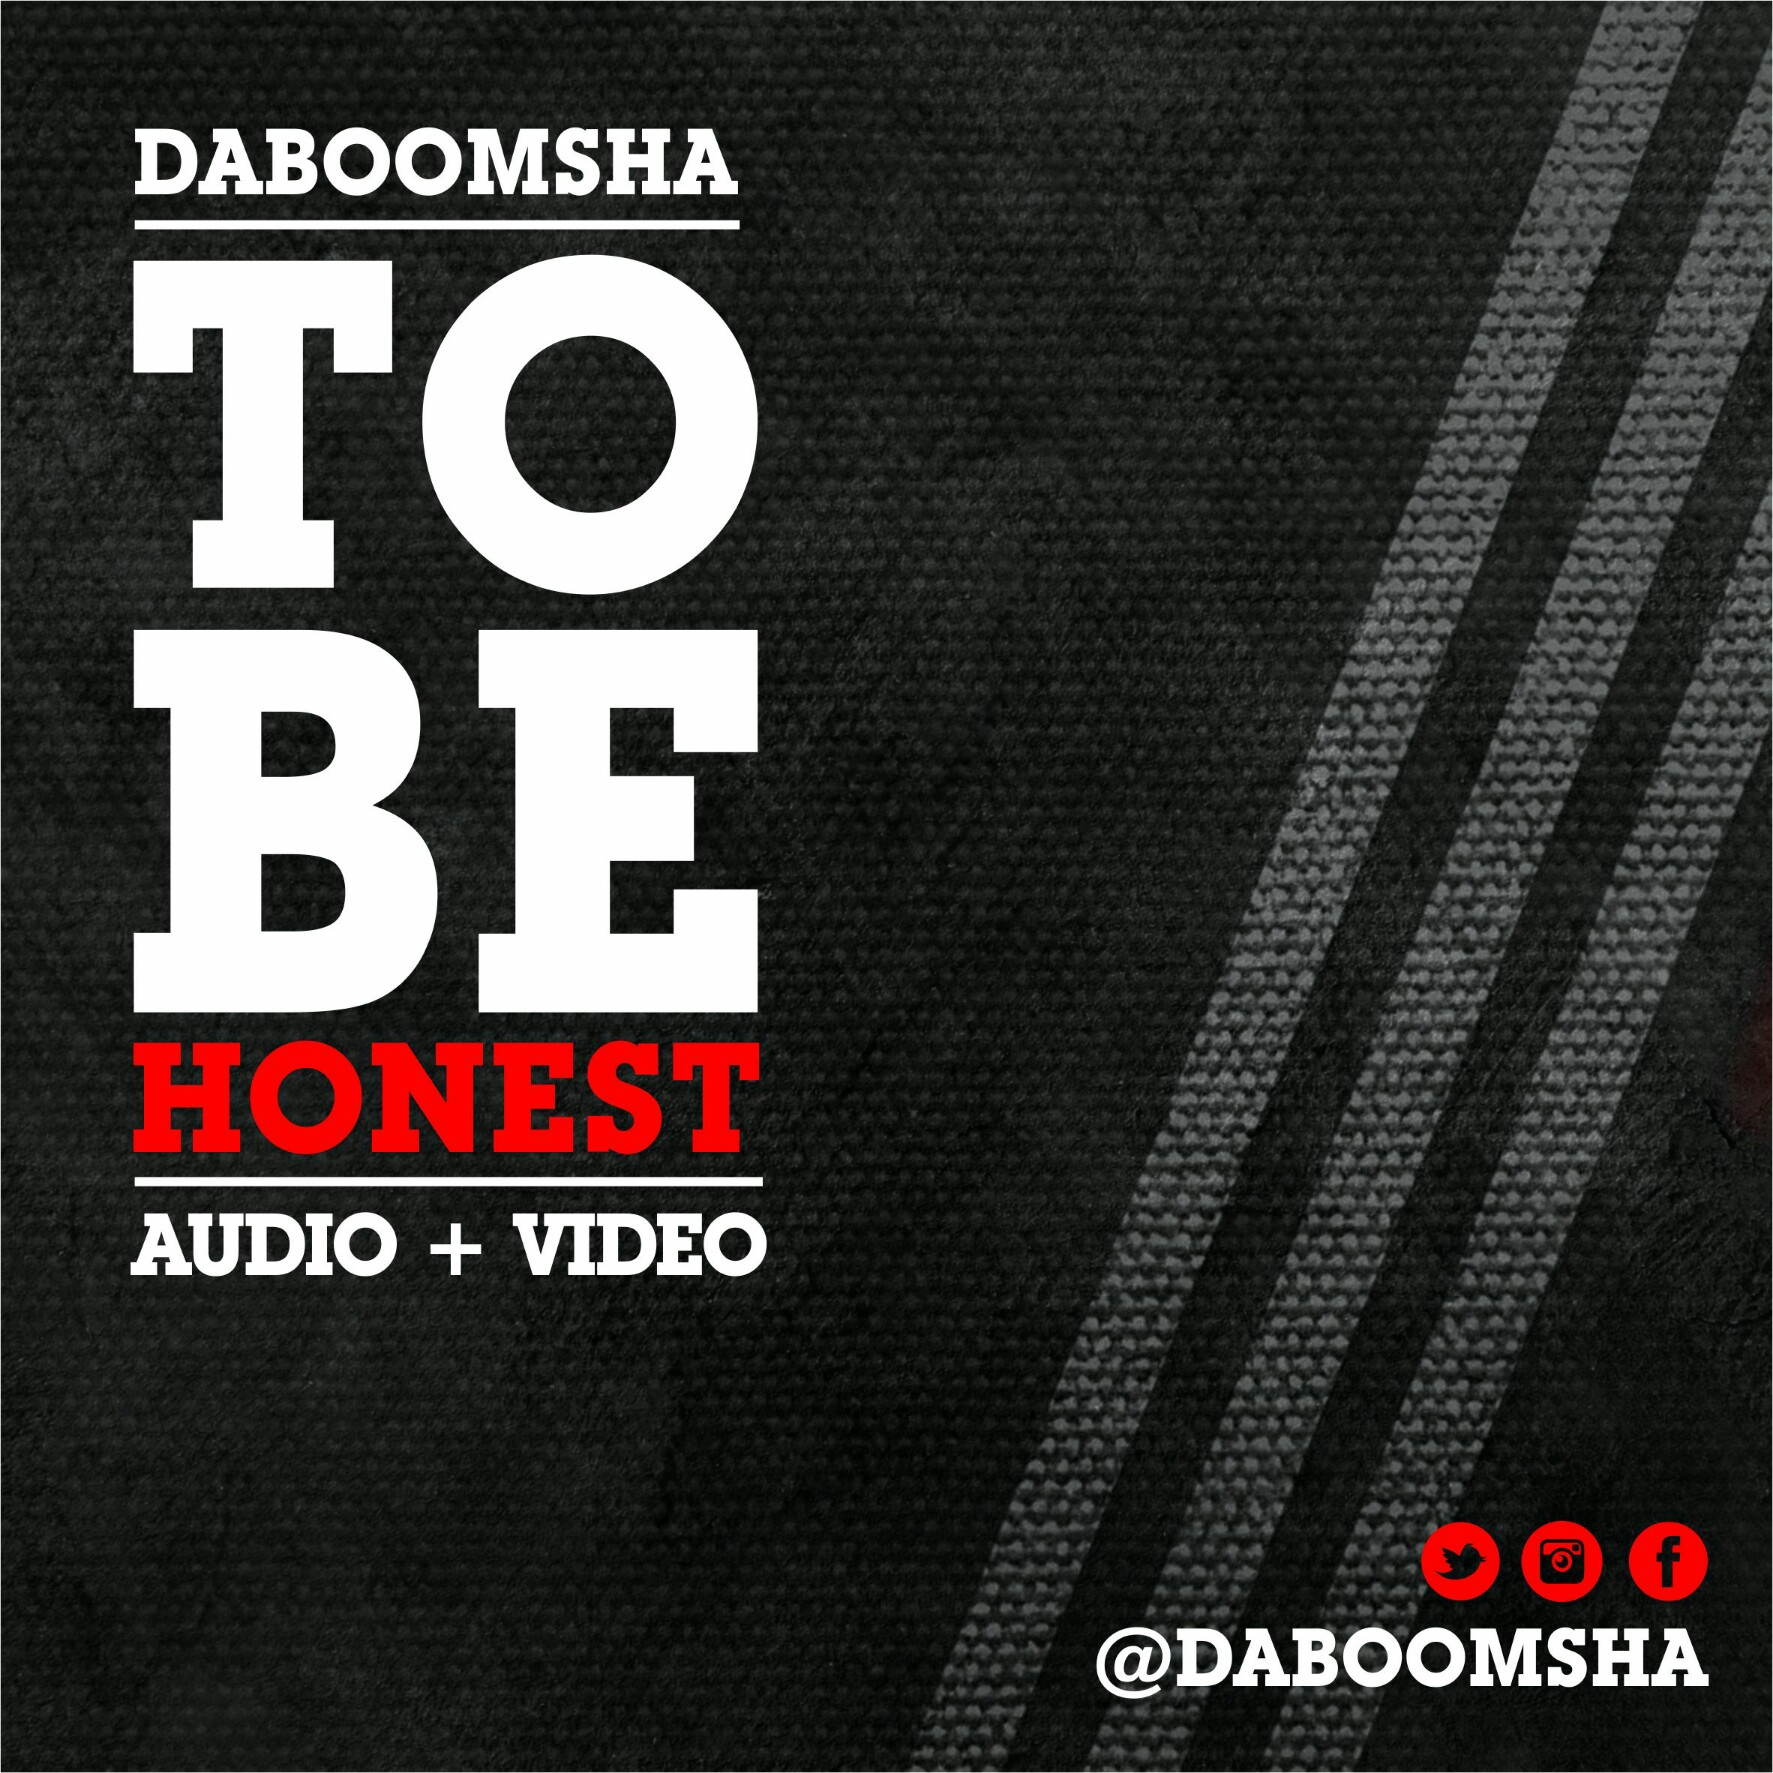 MUSIC Video + Audio: Daboomsha – To Be Honest